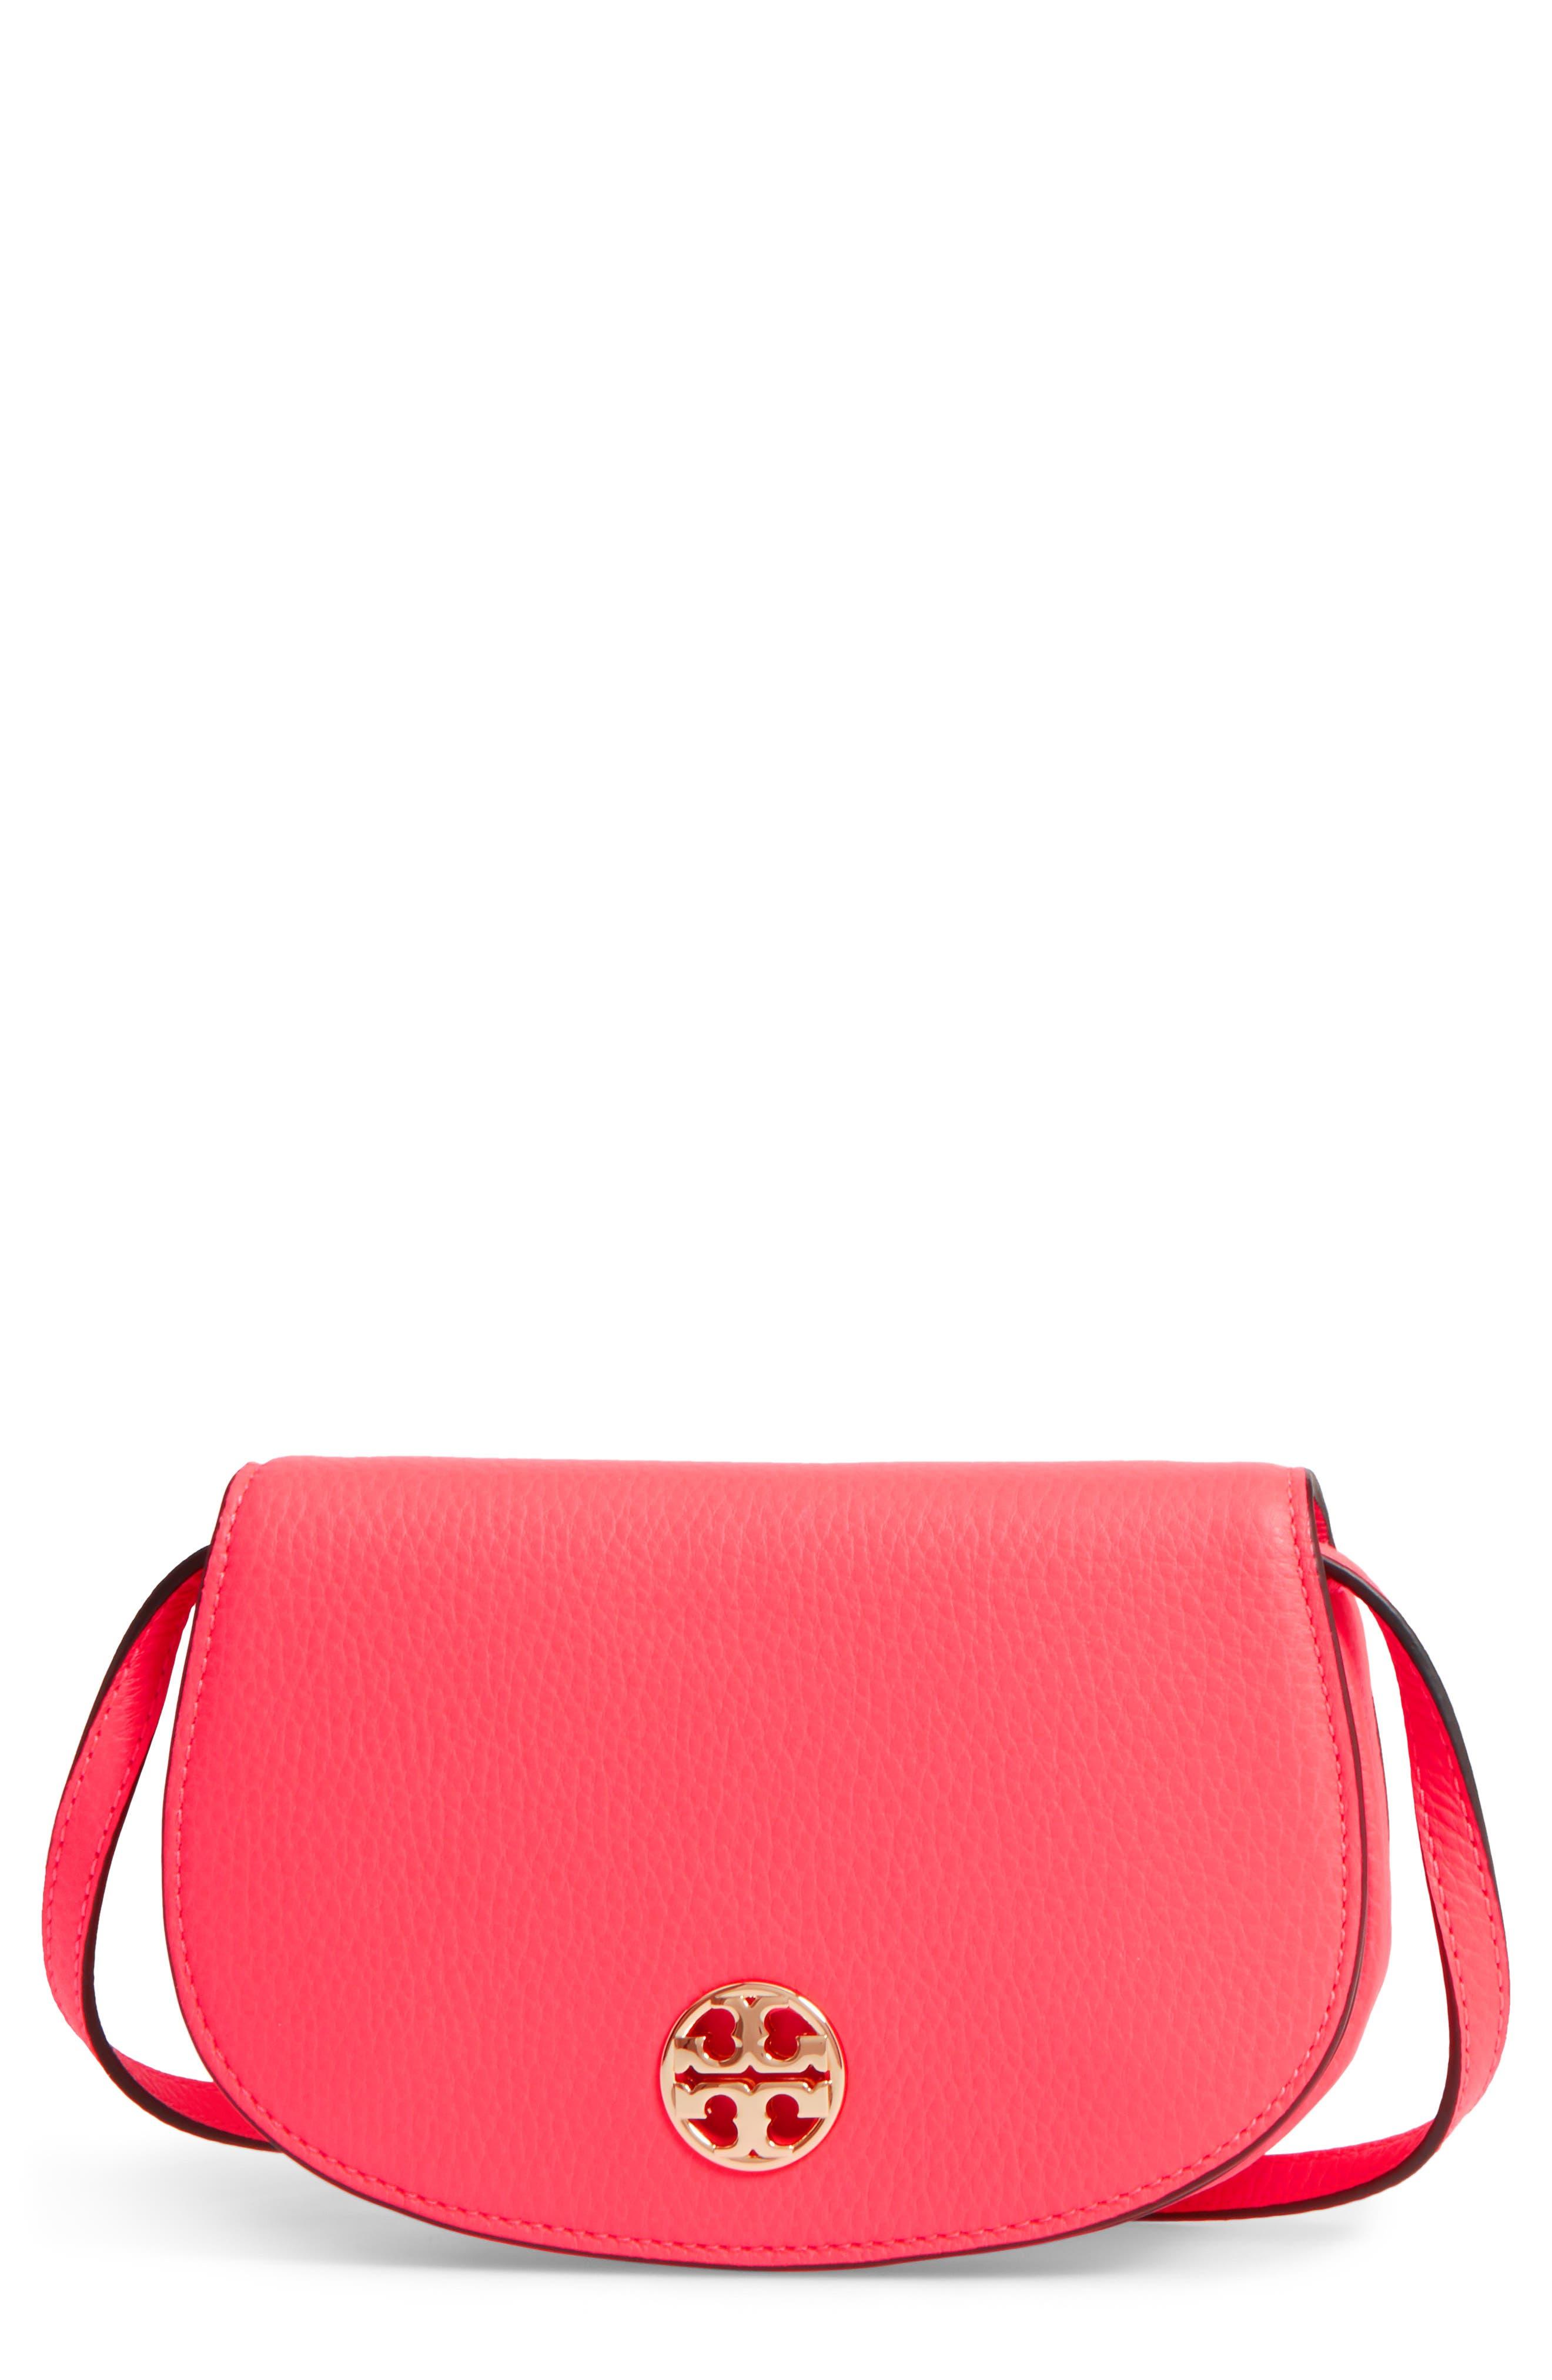 TORY BURCH Mini Jamie Leather Crossbody Bag